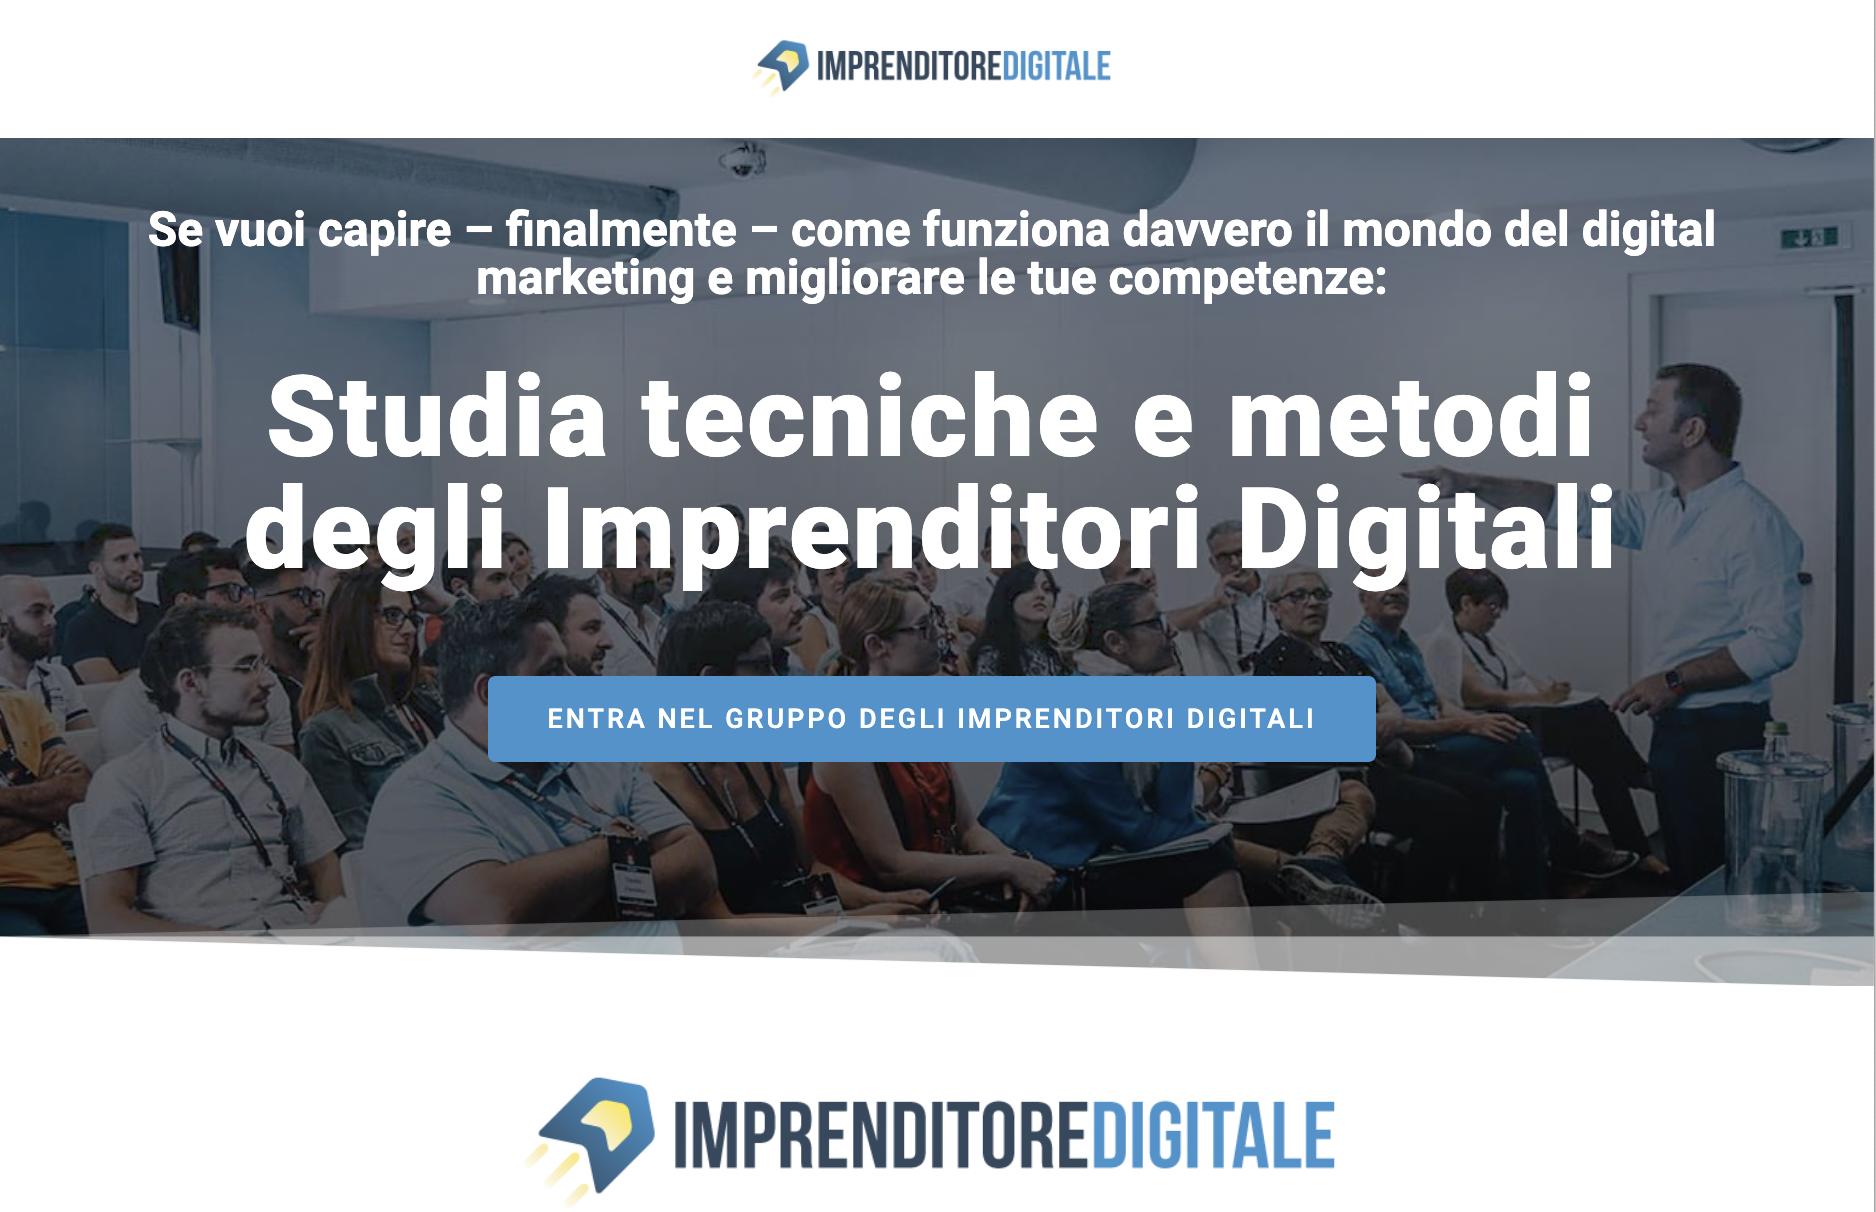 Imprenditori digitali